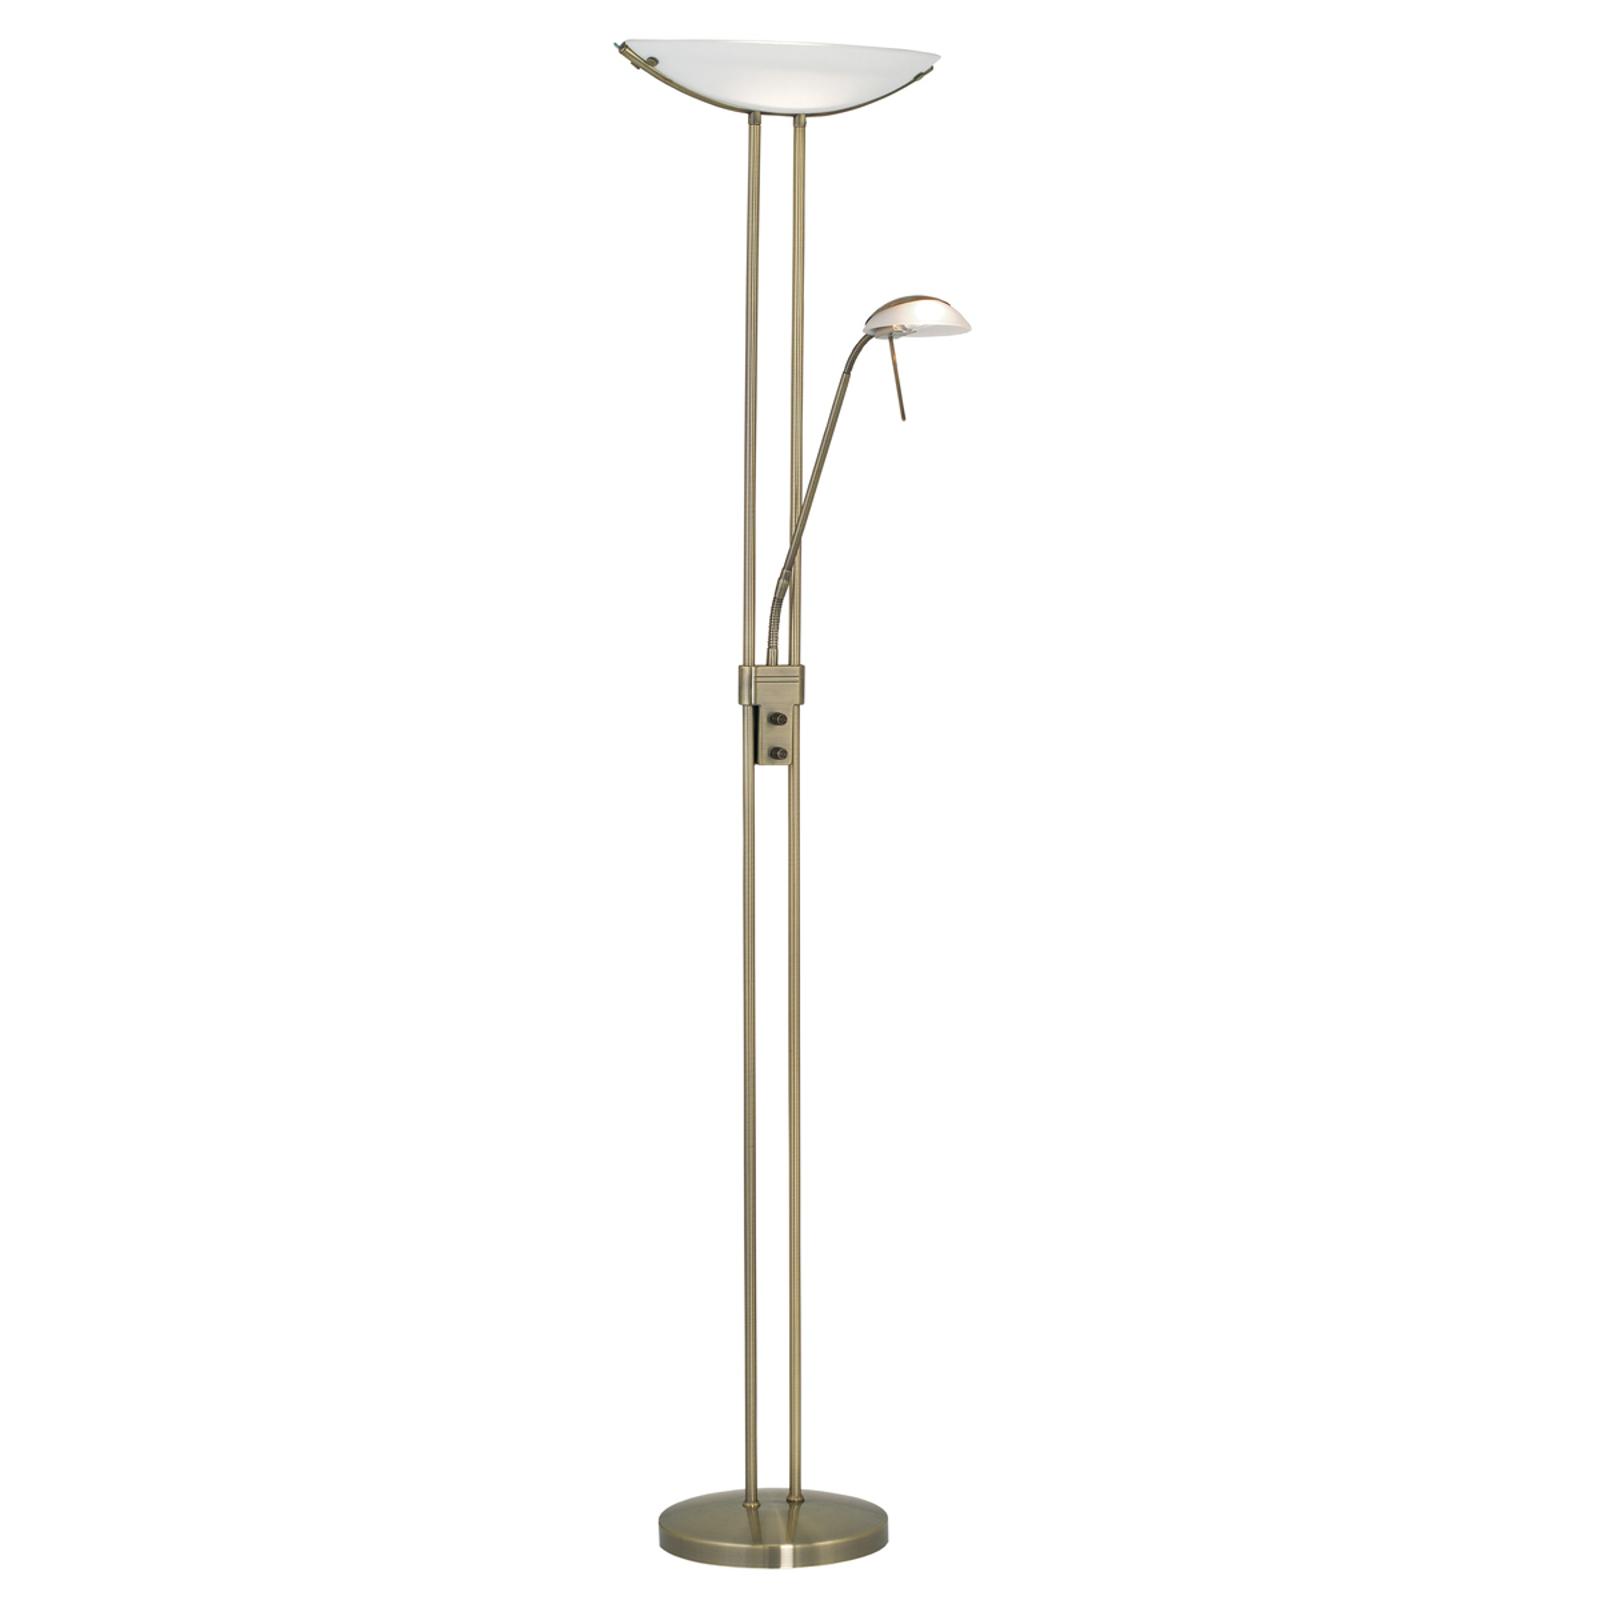 Elegante lampada da pavimento Baya brunito